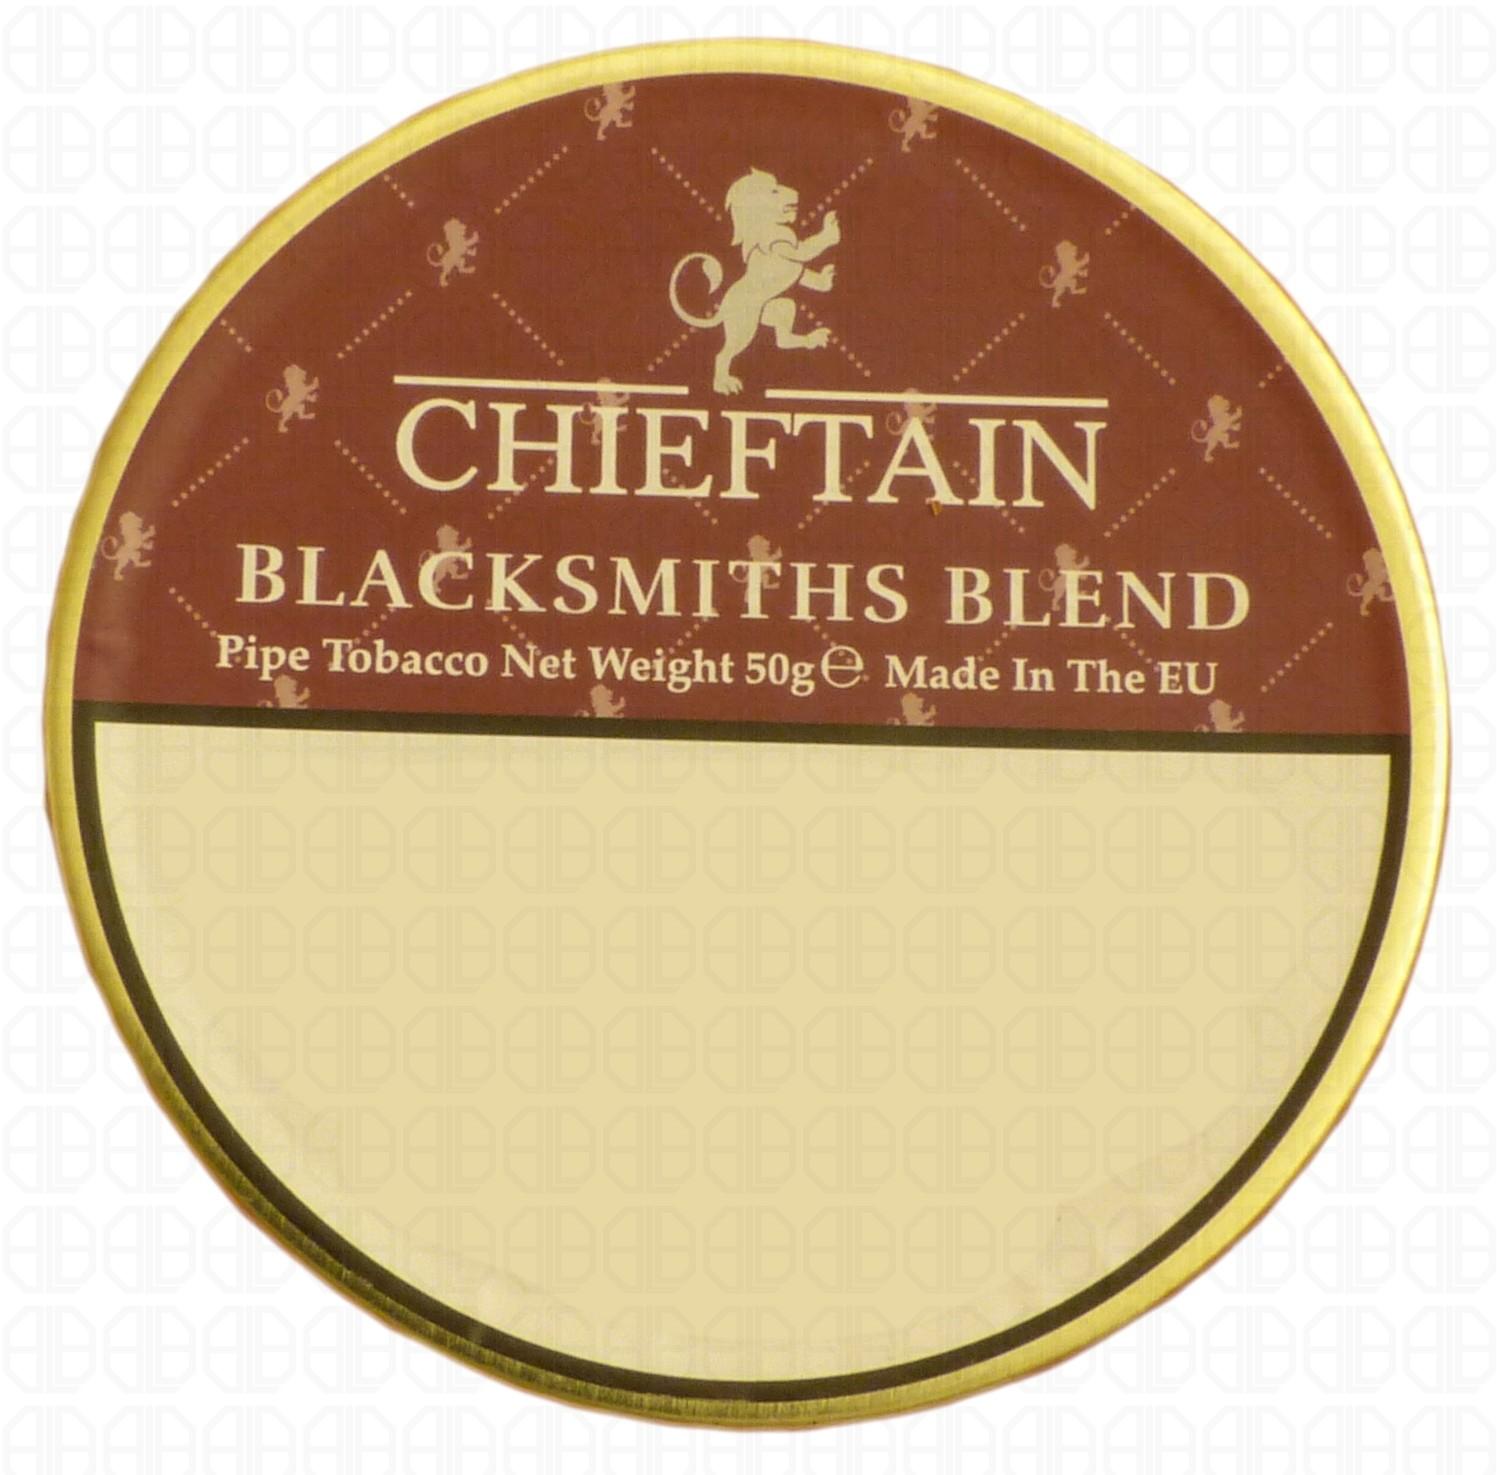 Chieftain Blacksmiths Blend (50g)